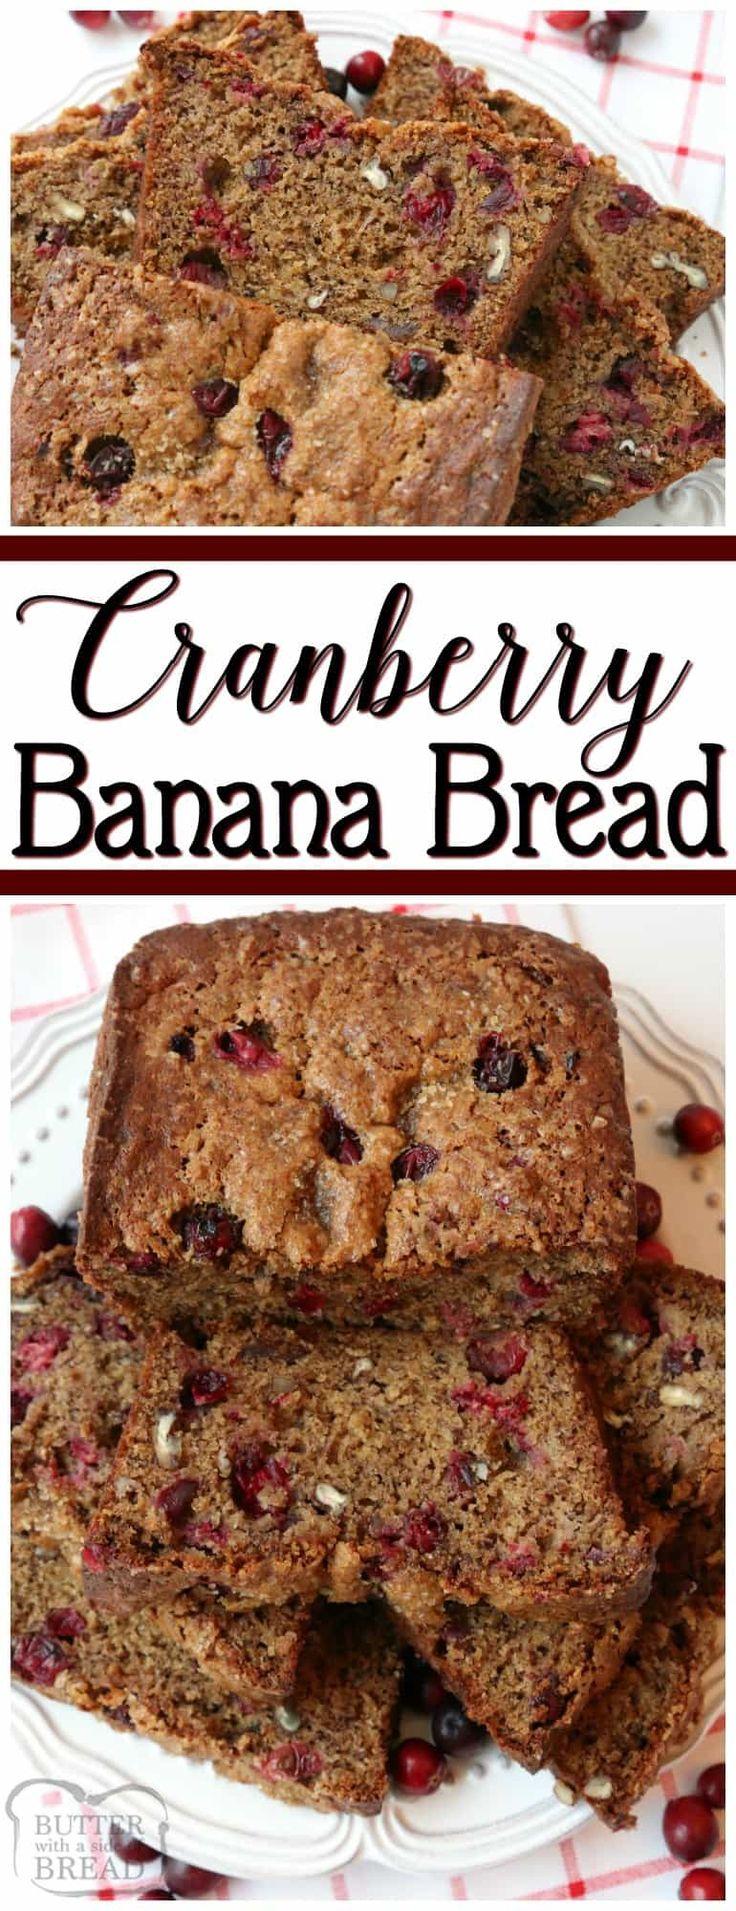 Cranberry Banana Bread. #Thanksgiving #Christmas #breakfast